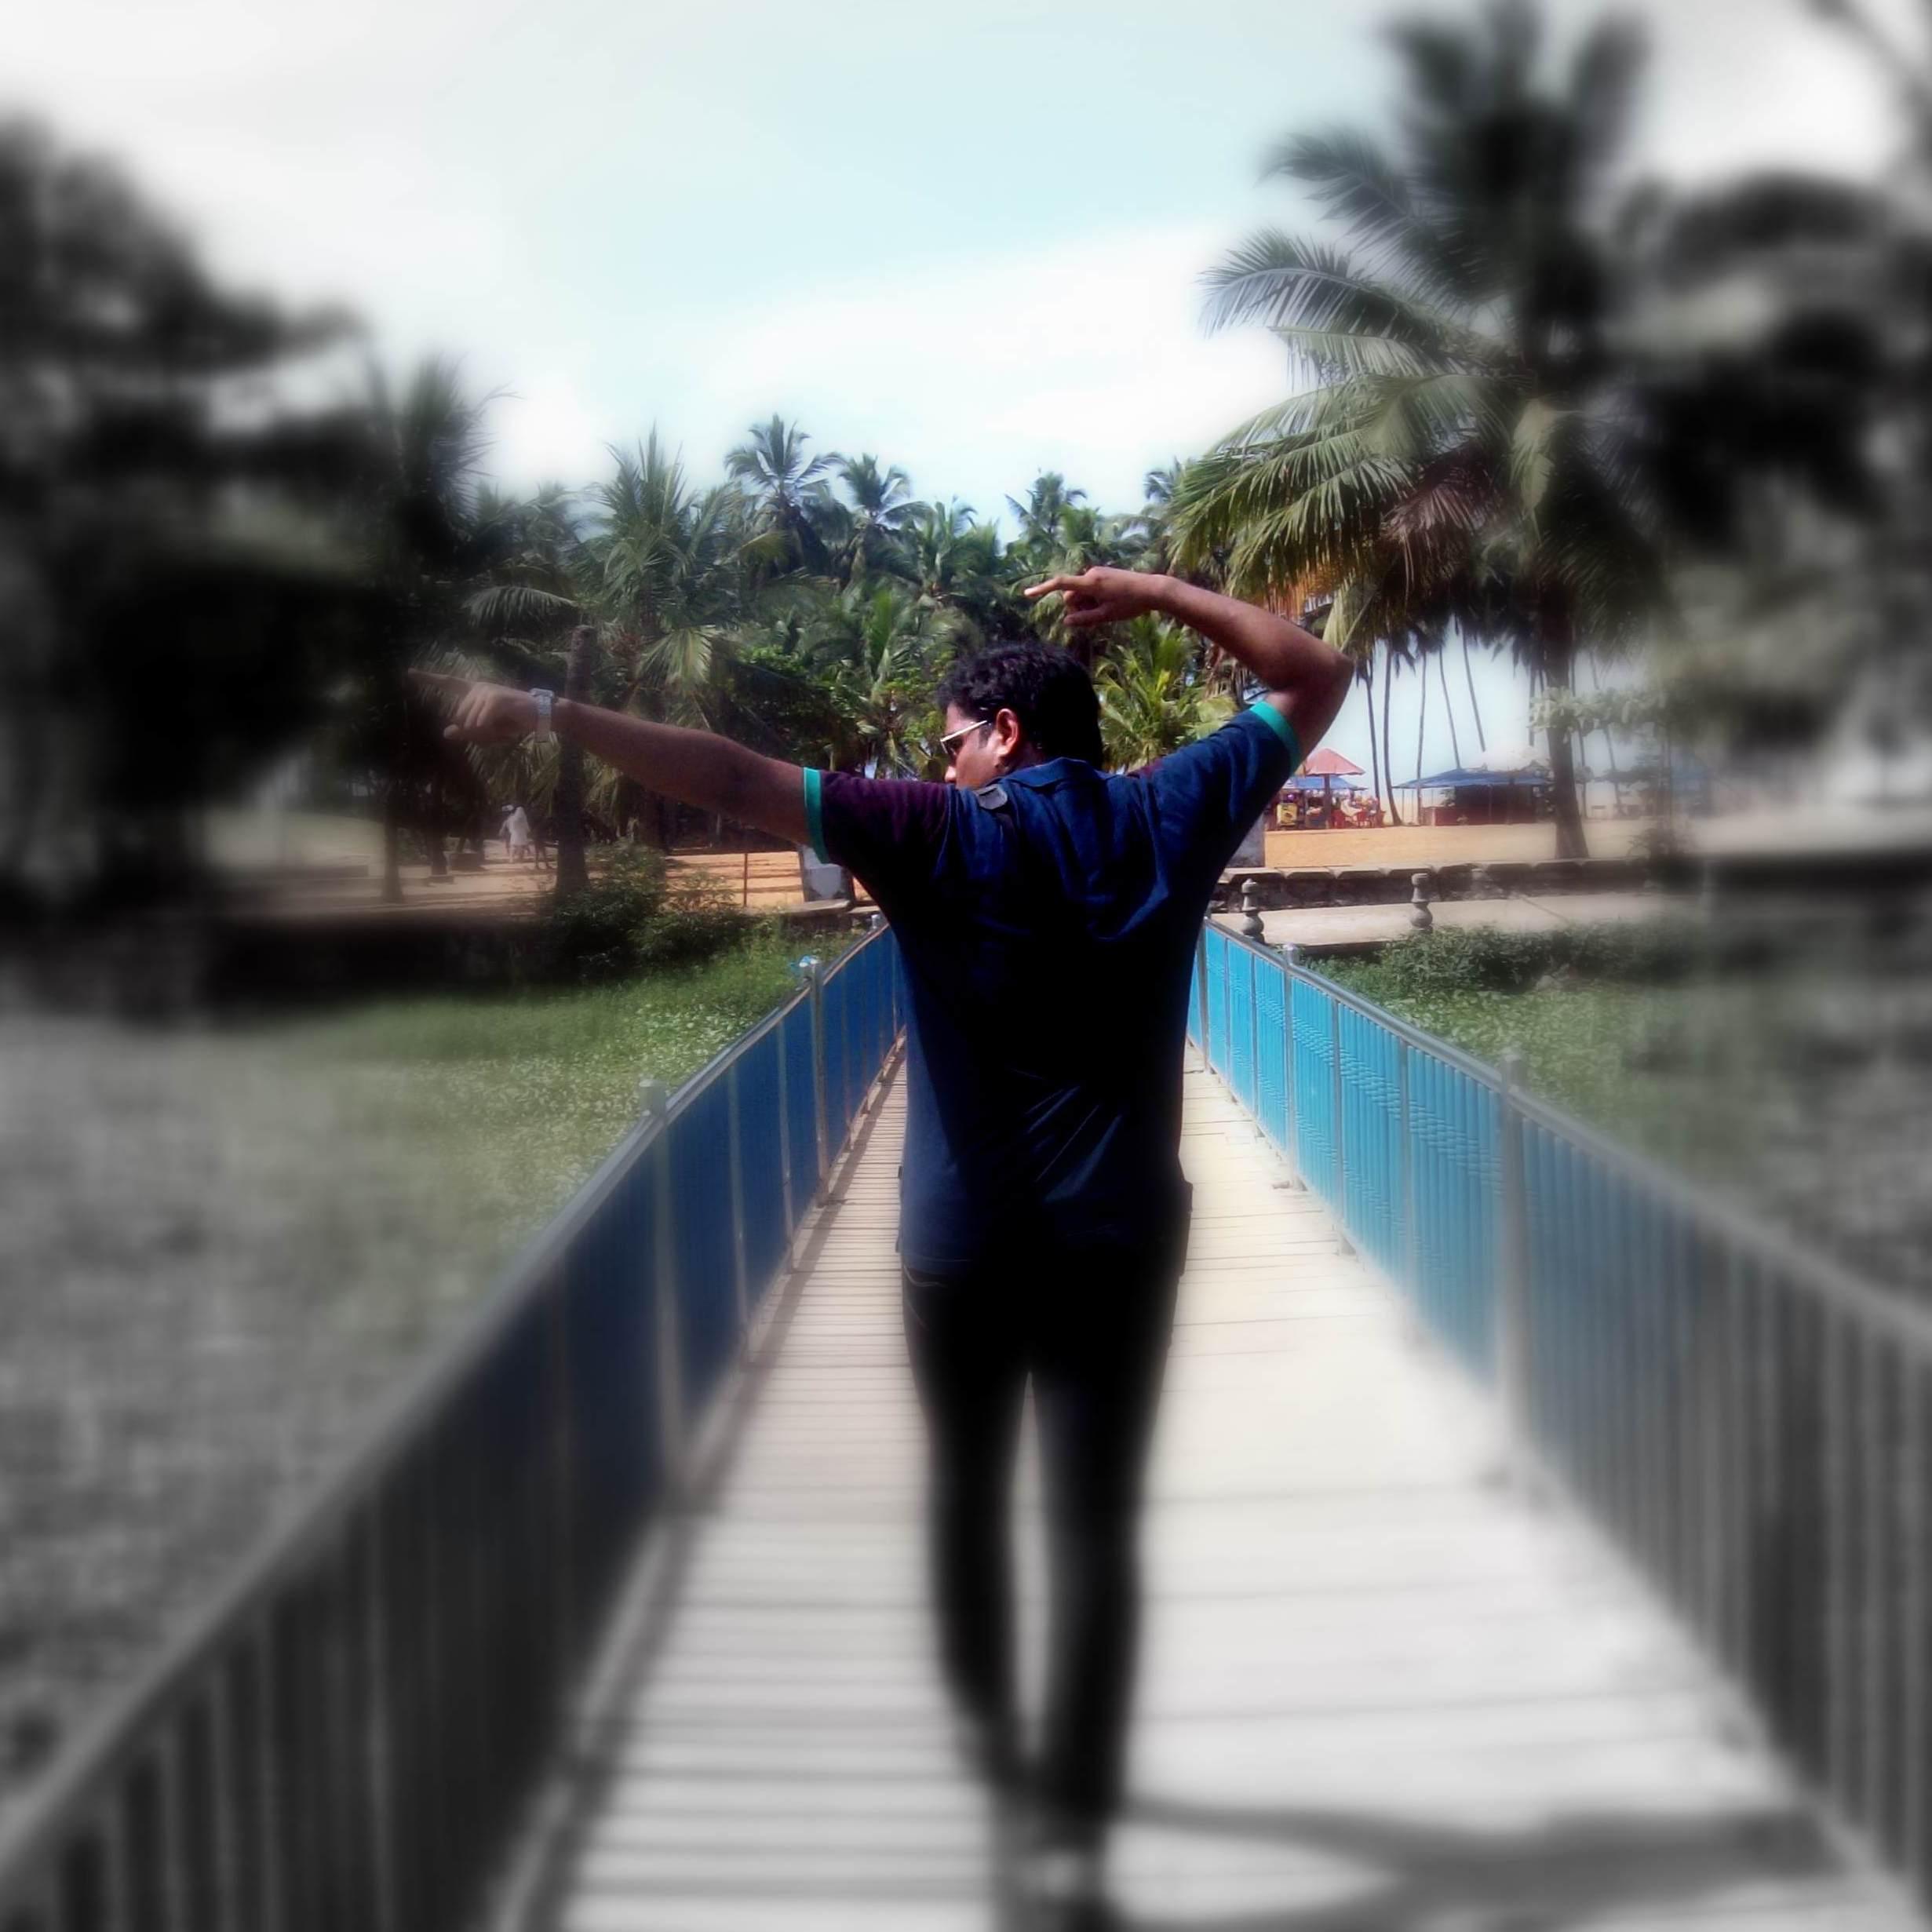 Soundar Rajan